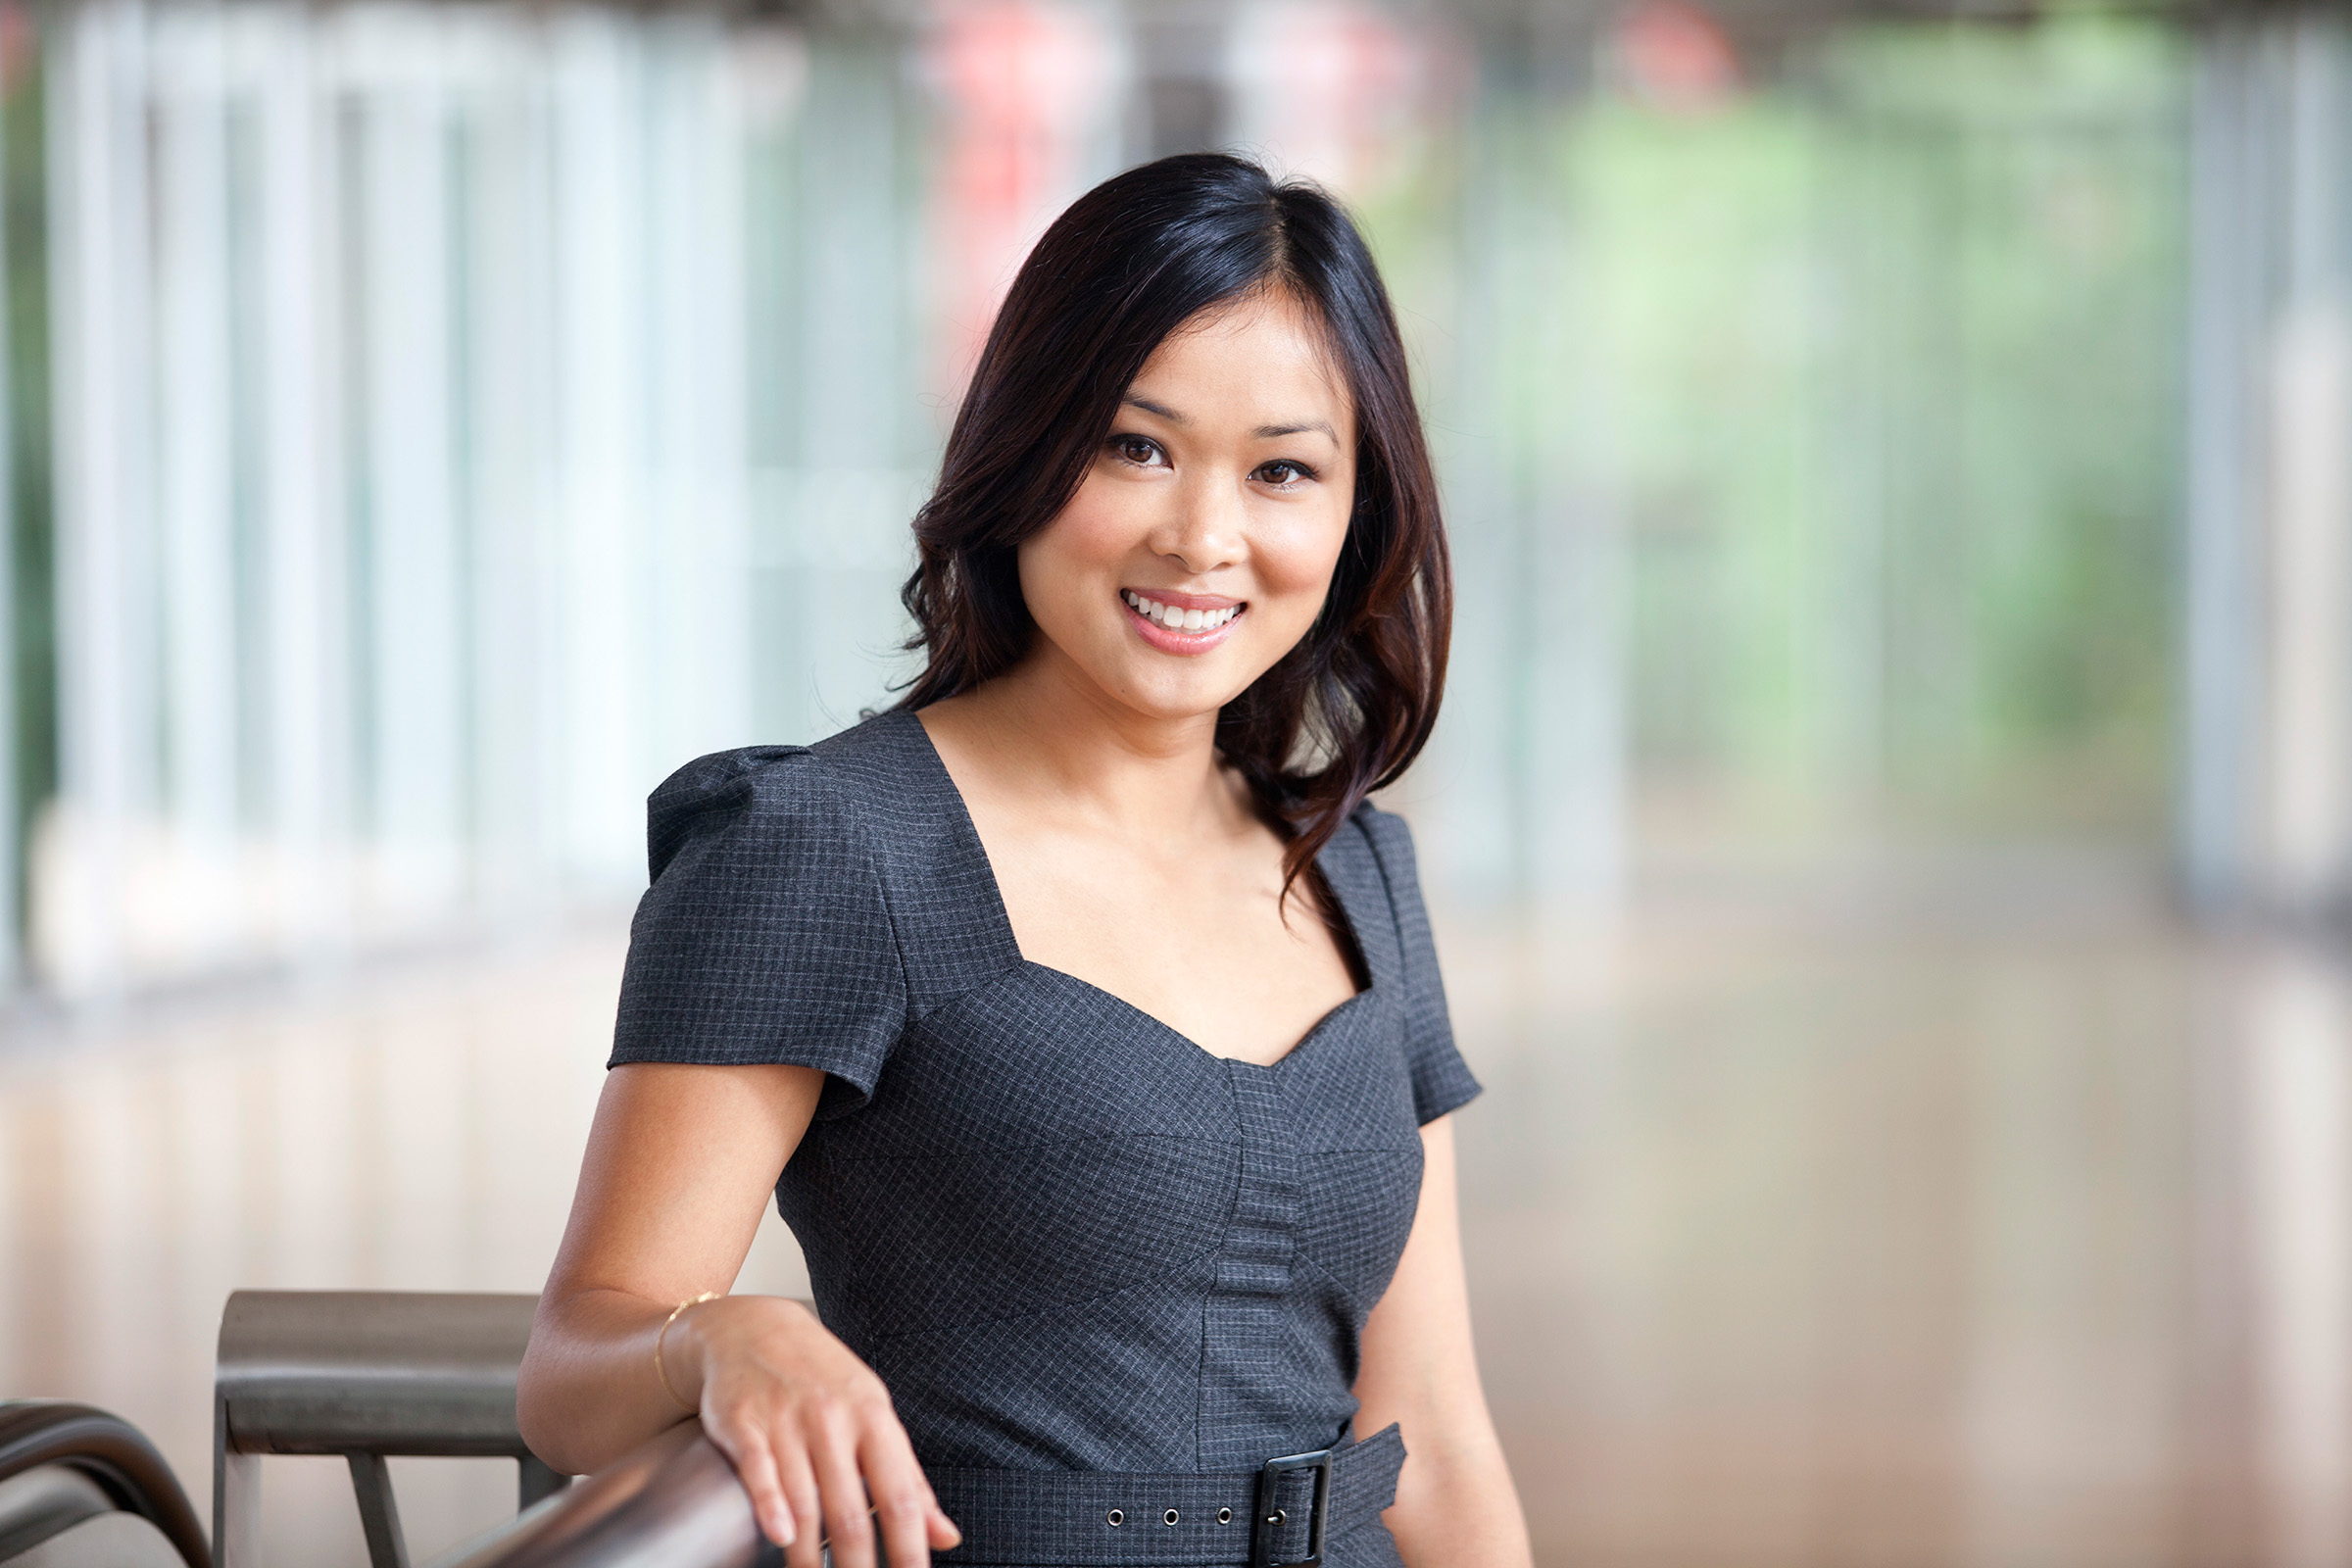 Corporate environmental location portrait photography PWC female business attire